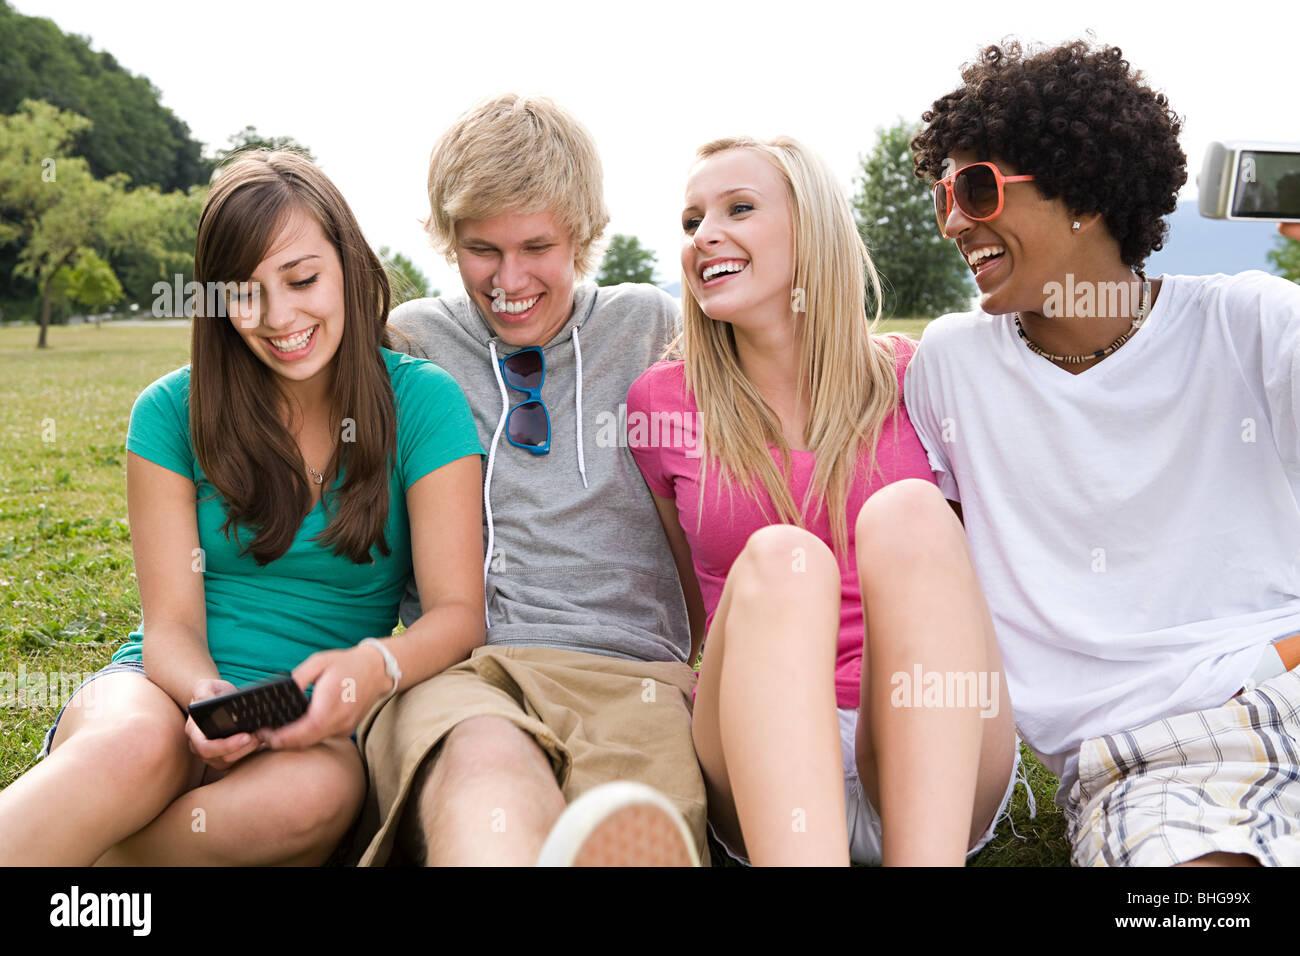 Teenage friends in park - Stock Image